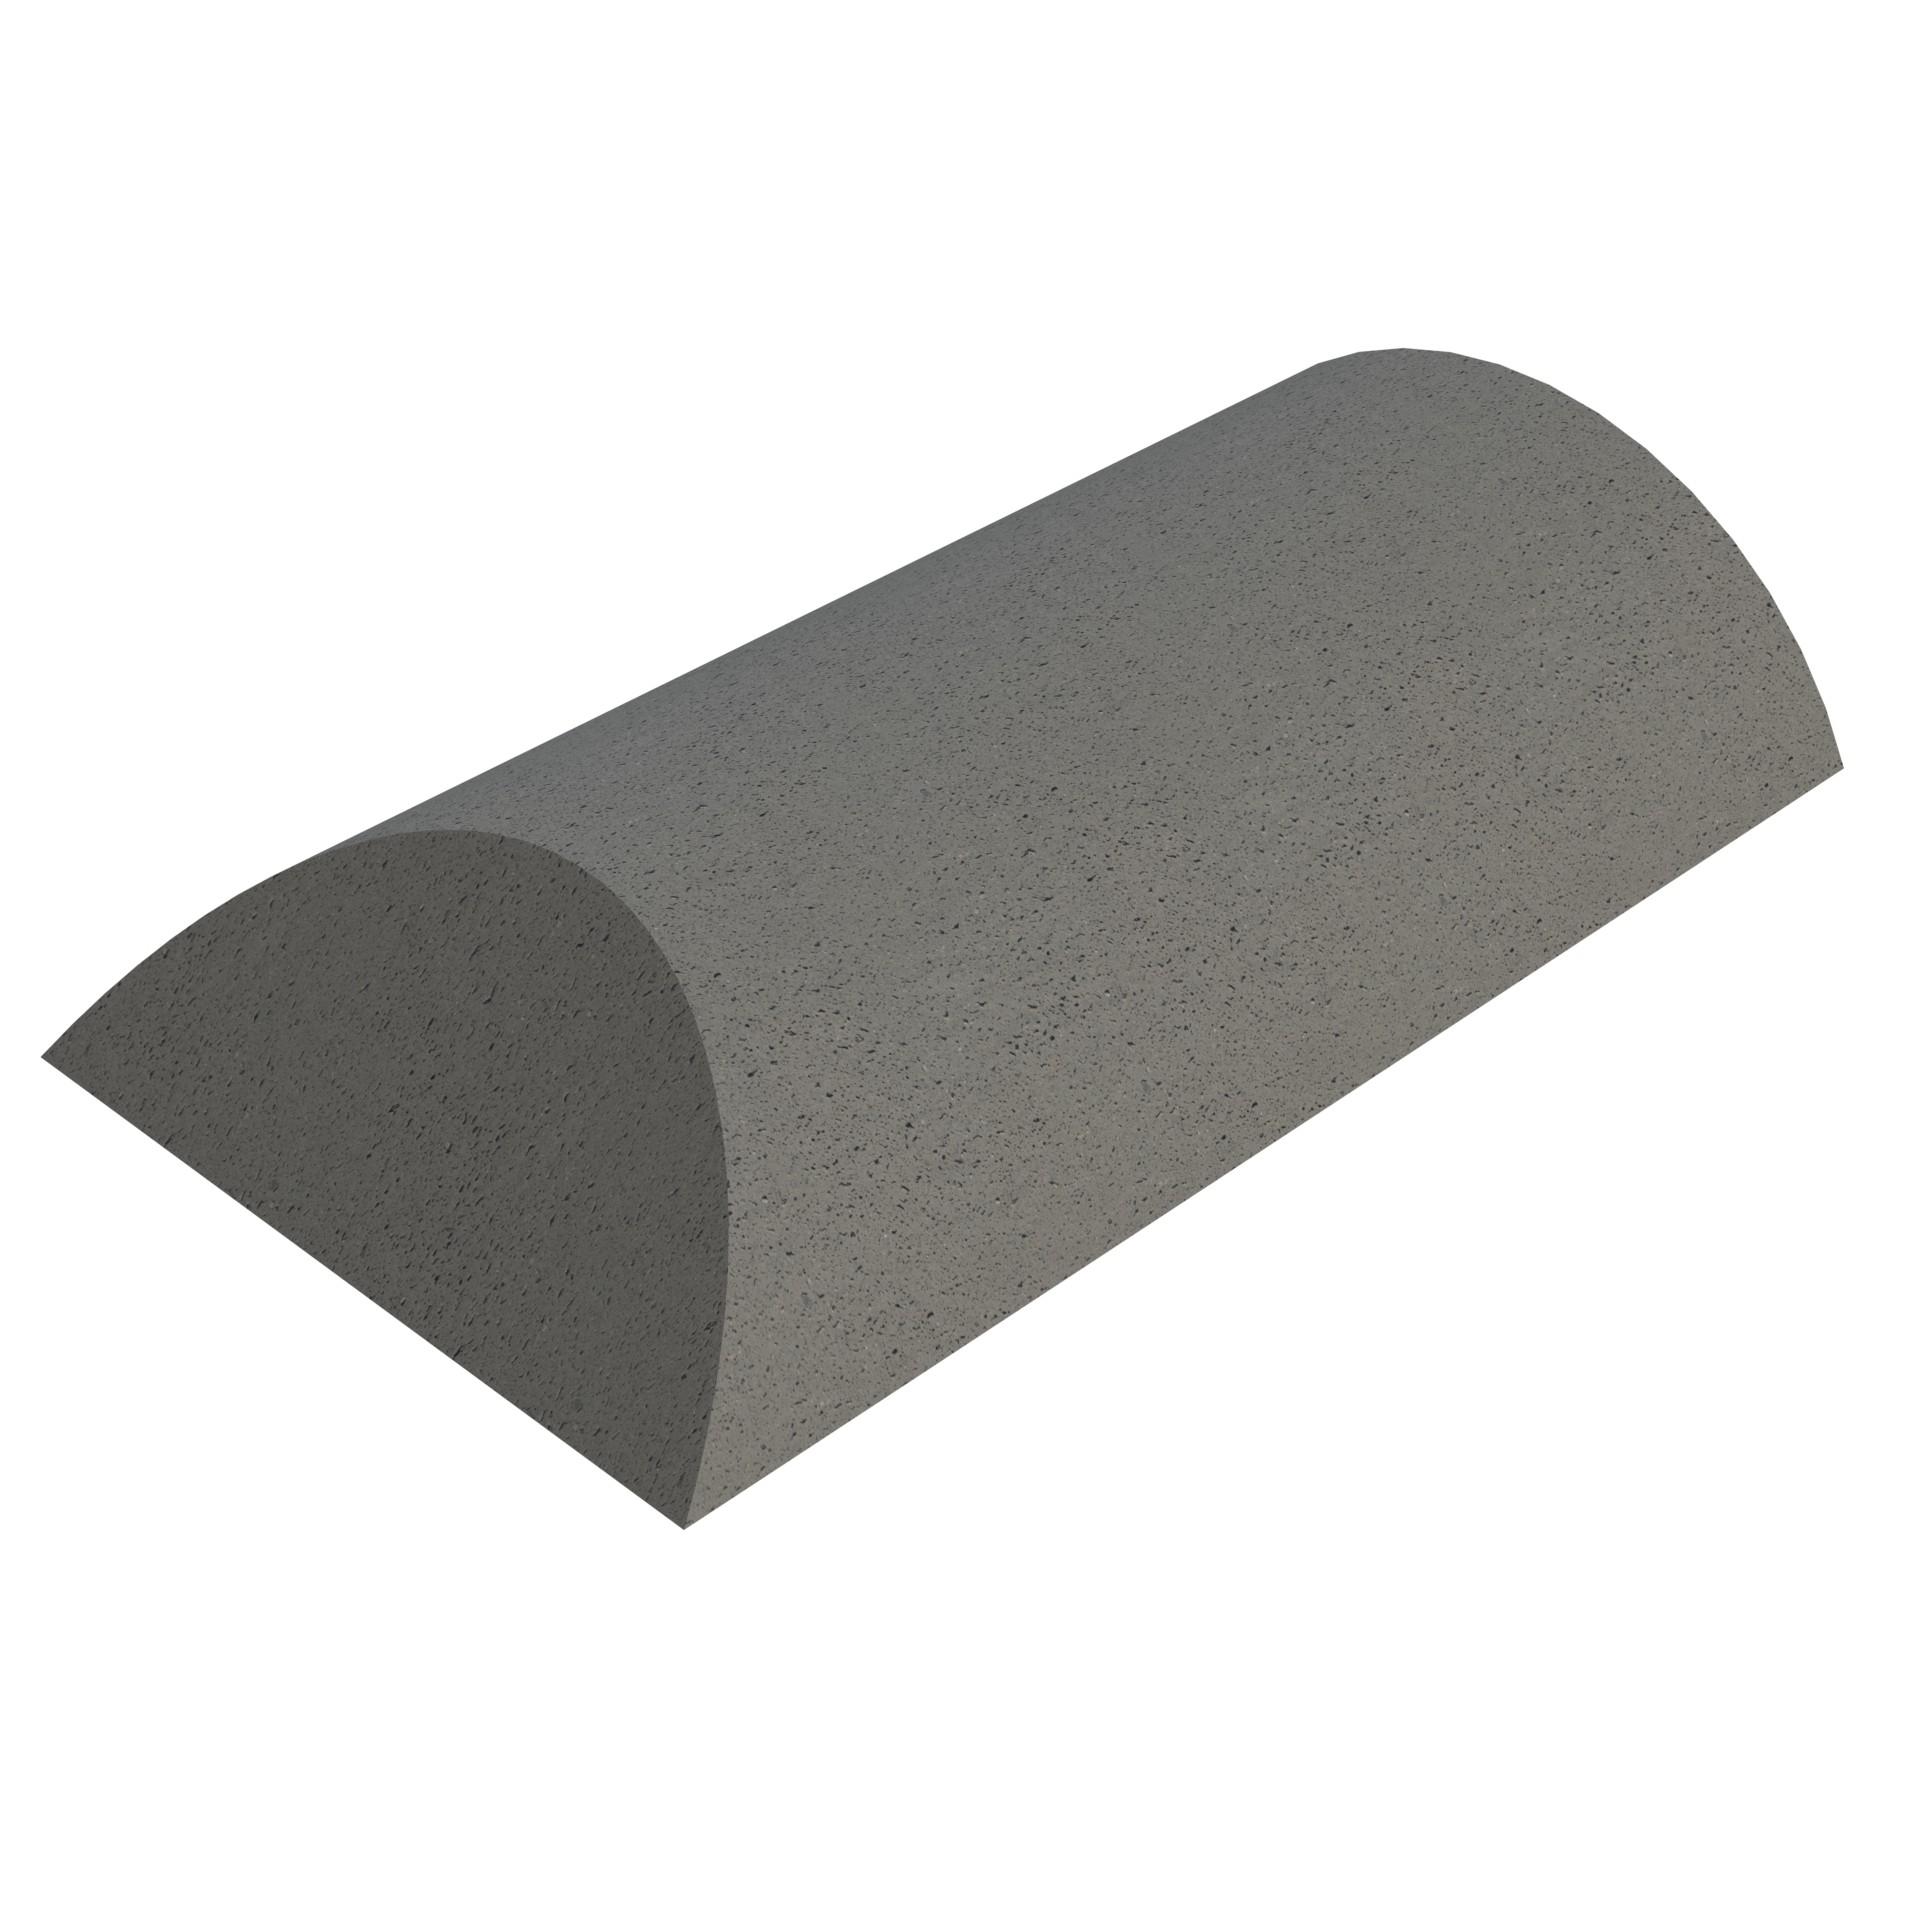 SANDTOFT TILES - Concrete Segmental Ridge With Hip End